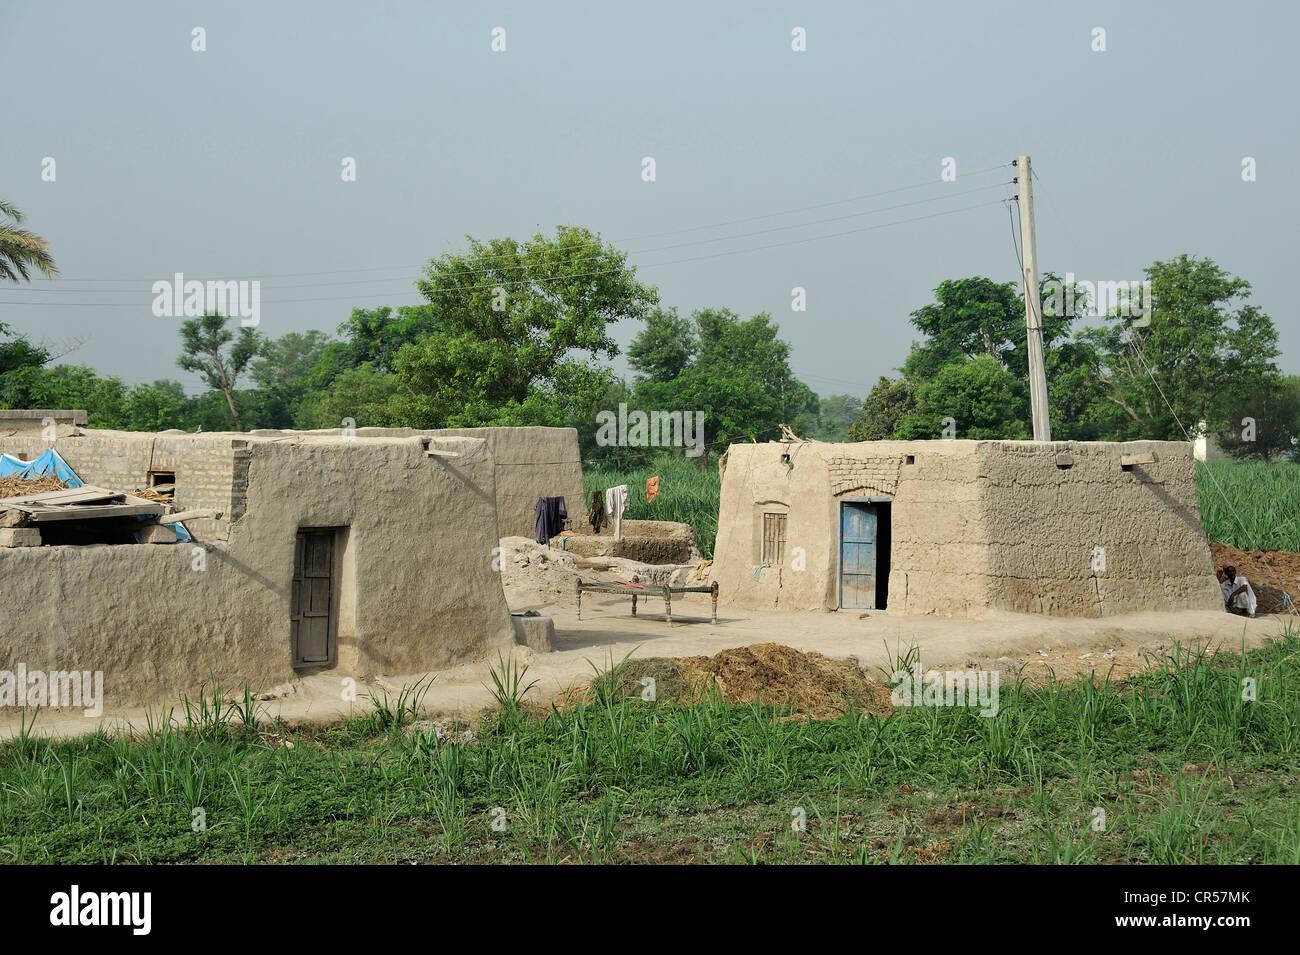 Village with traditional mud-brick houses, Lashari Wala village, Punjab, Pakistan, Asia - Stock Image